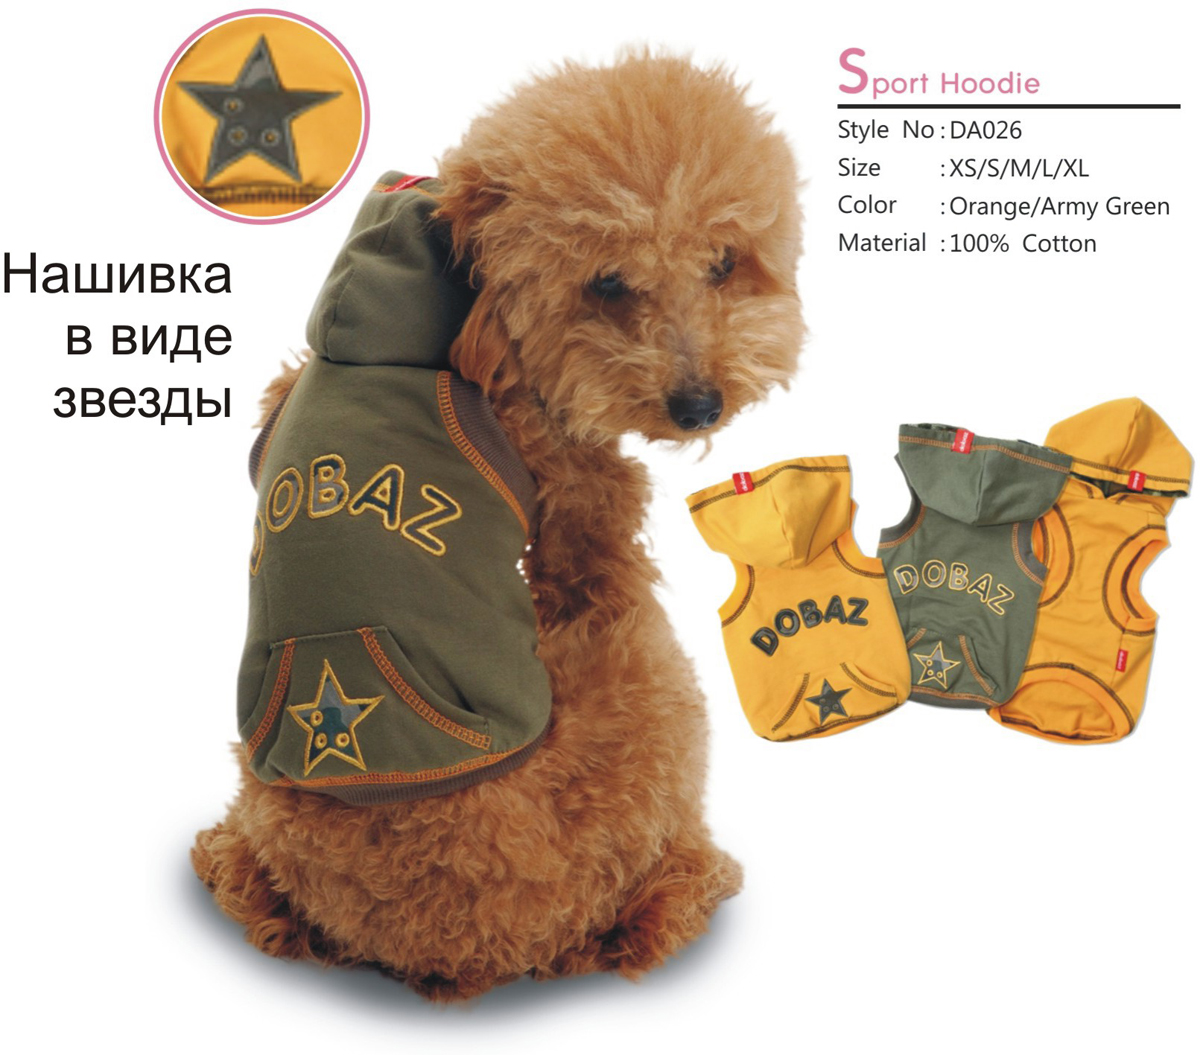 "Майка для собак ""Dobaz"", унисекс, цвет: хаки. ДА026БХХЛ. Размер XXL"